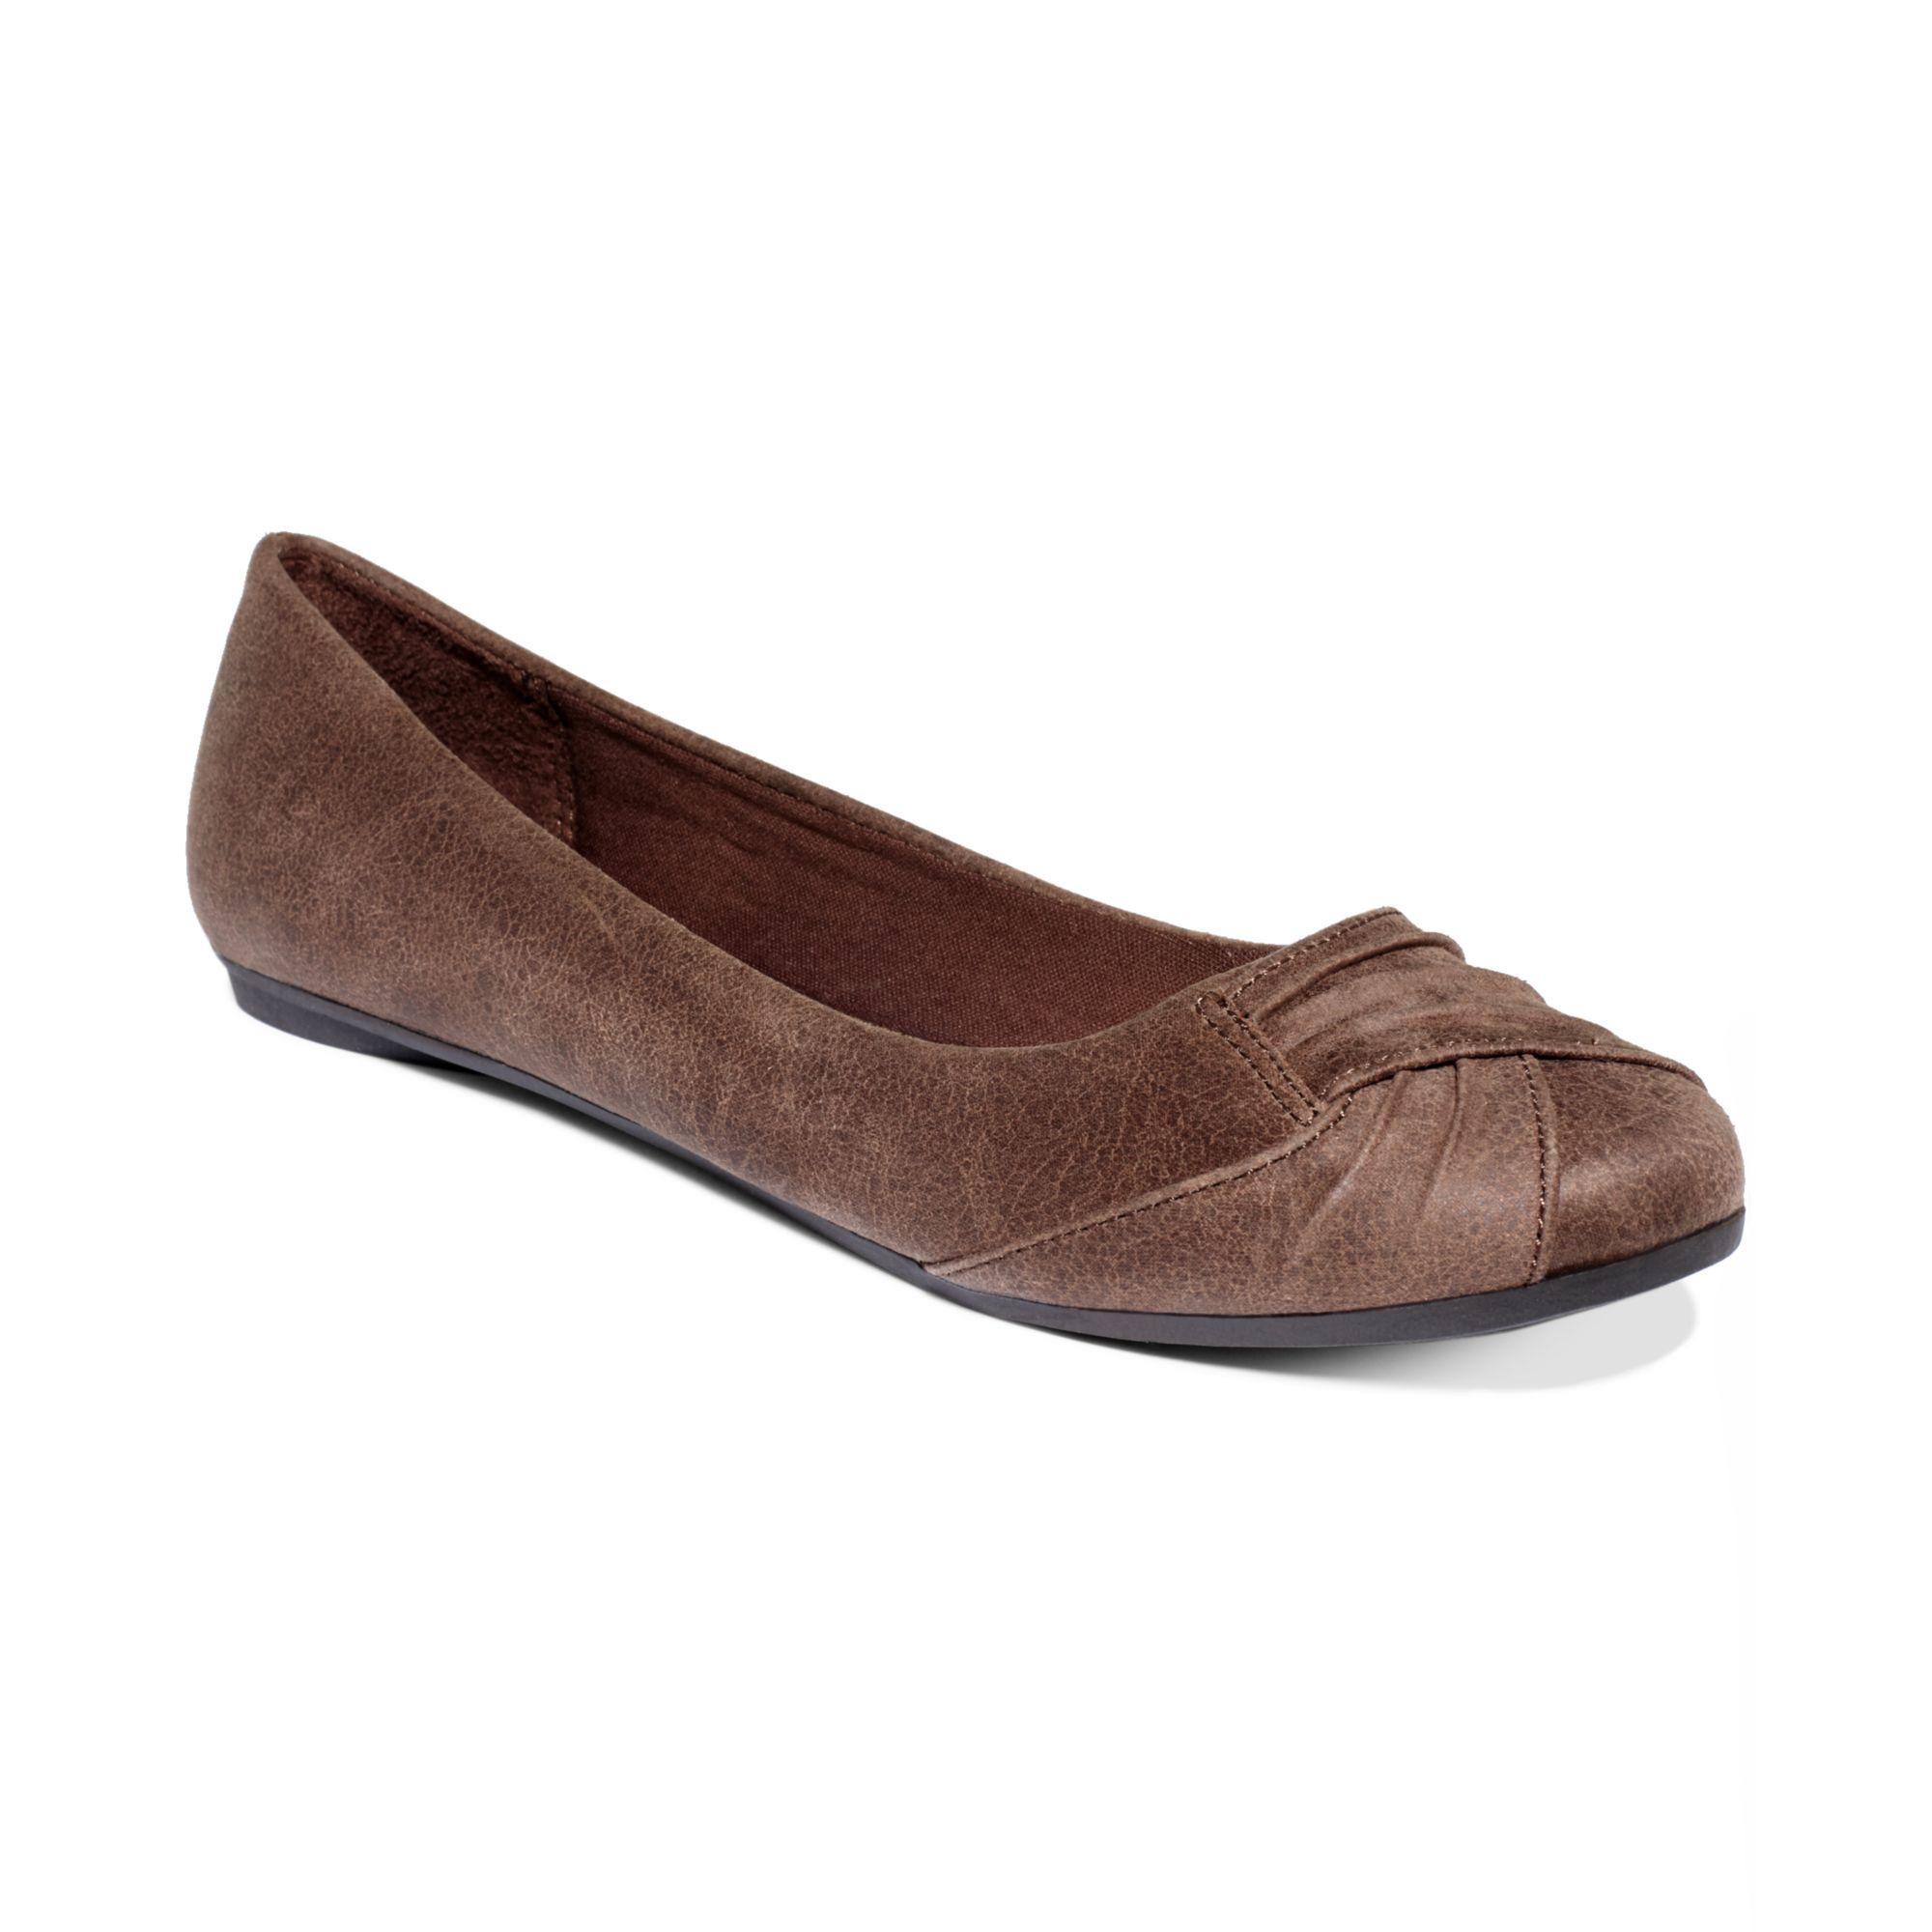 Fergalicious By Fergie Flat Shoes